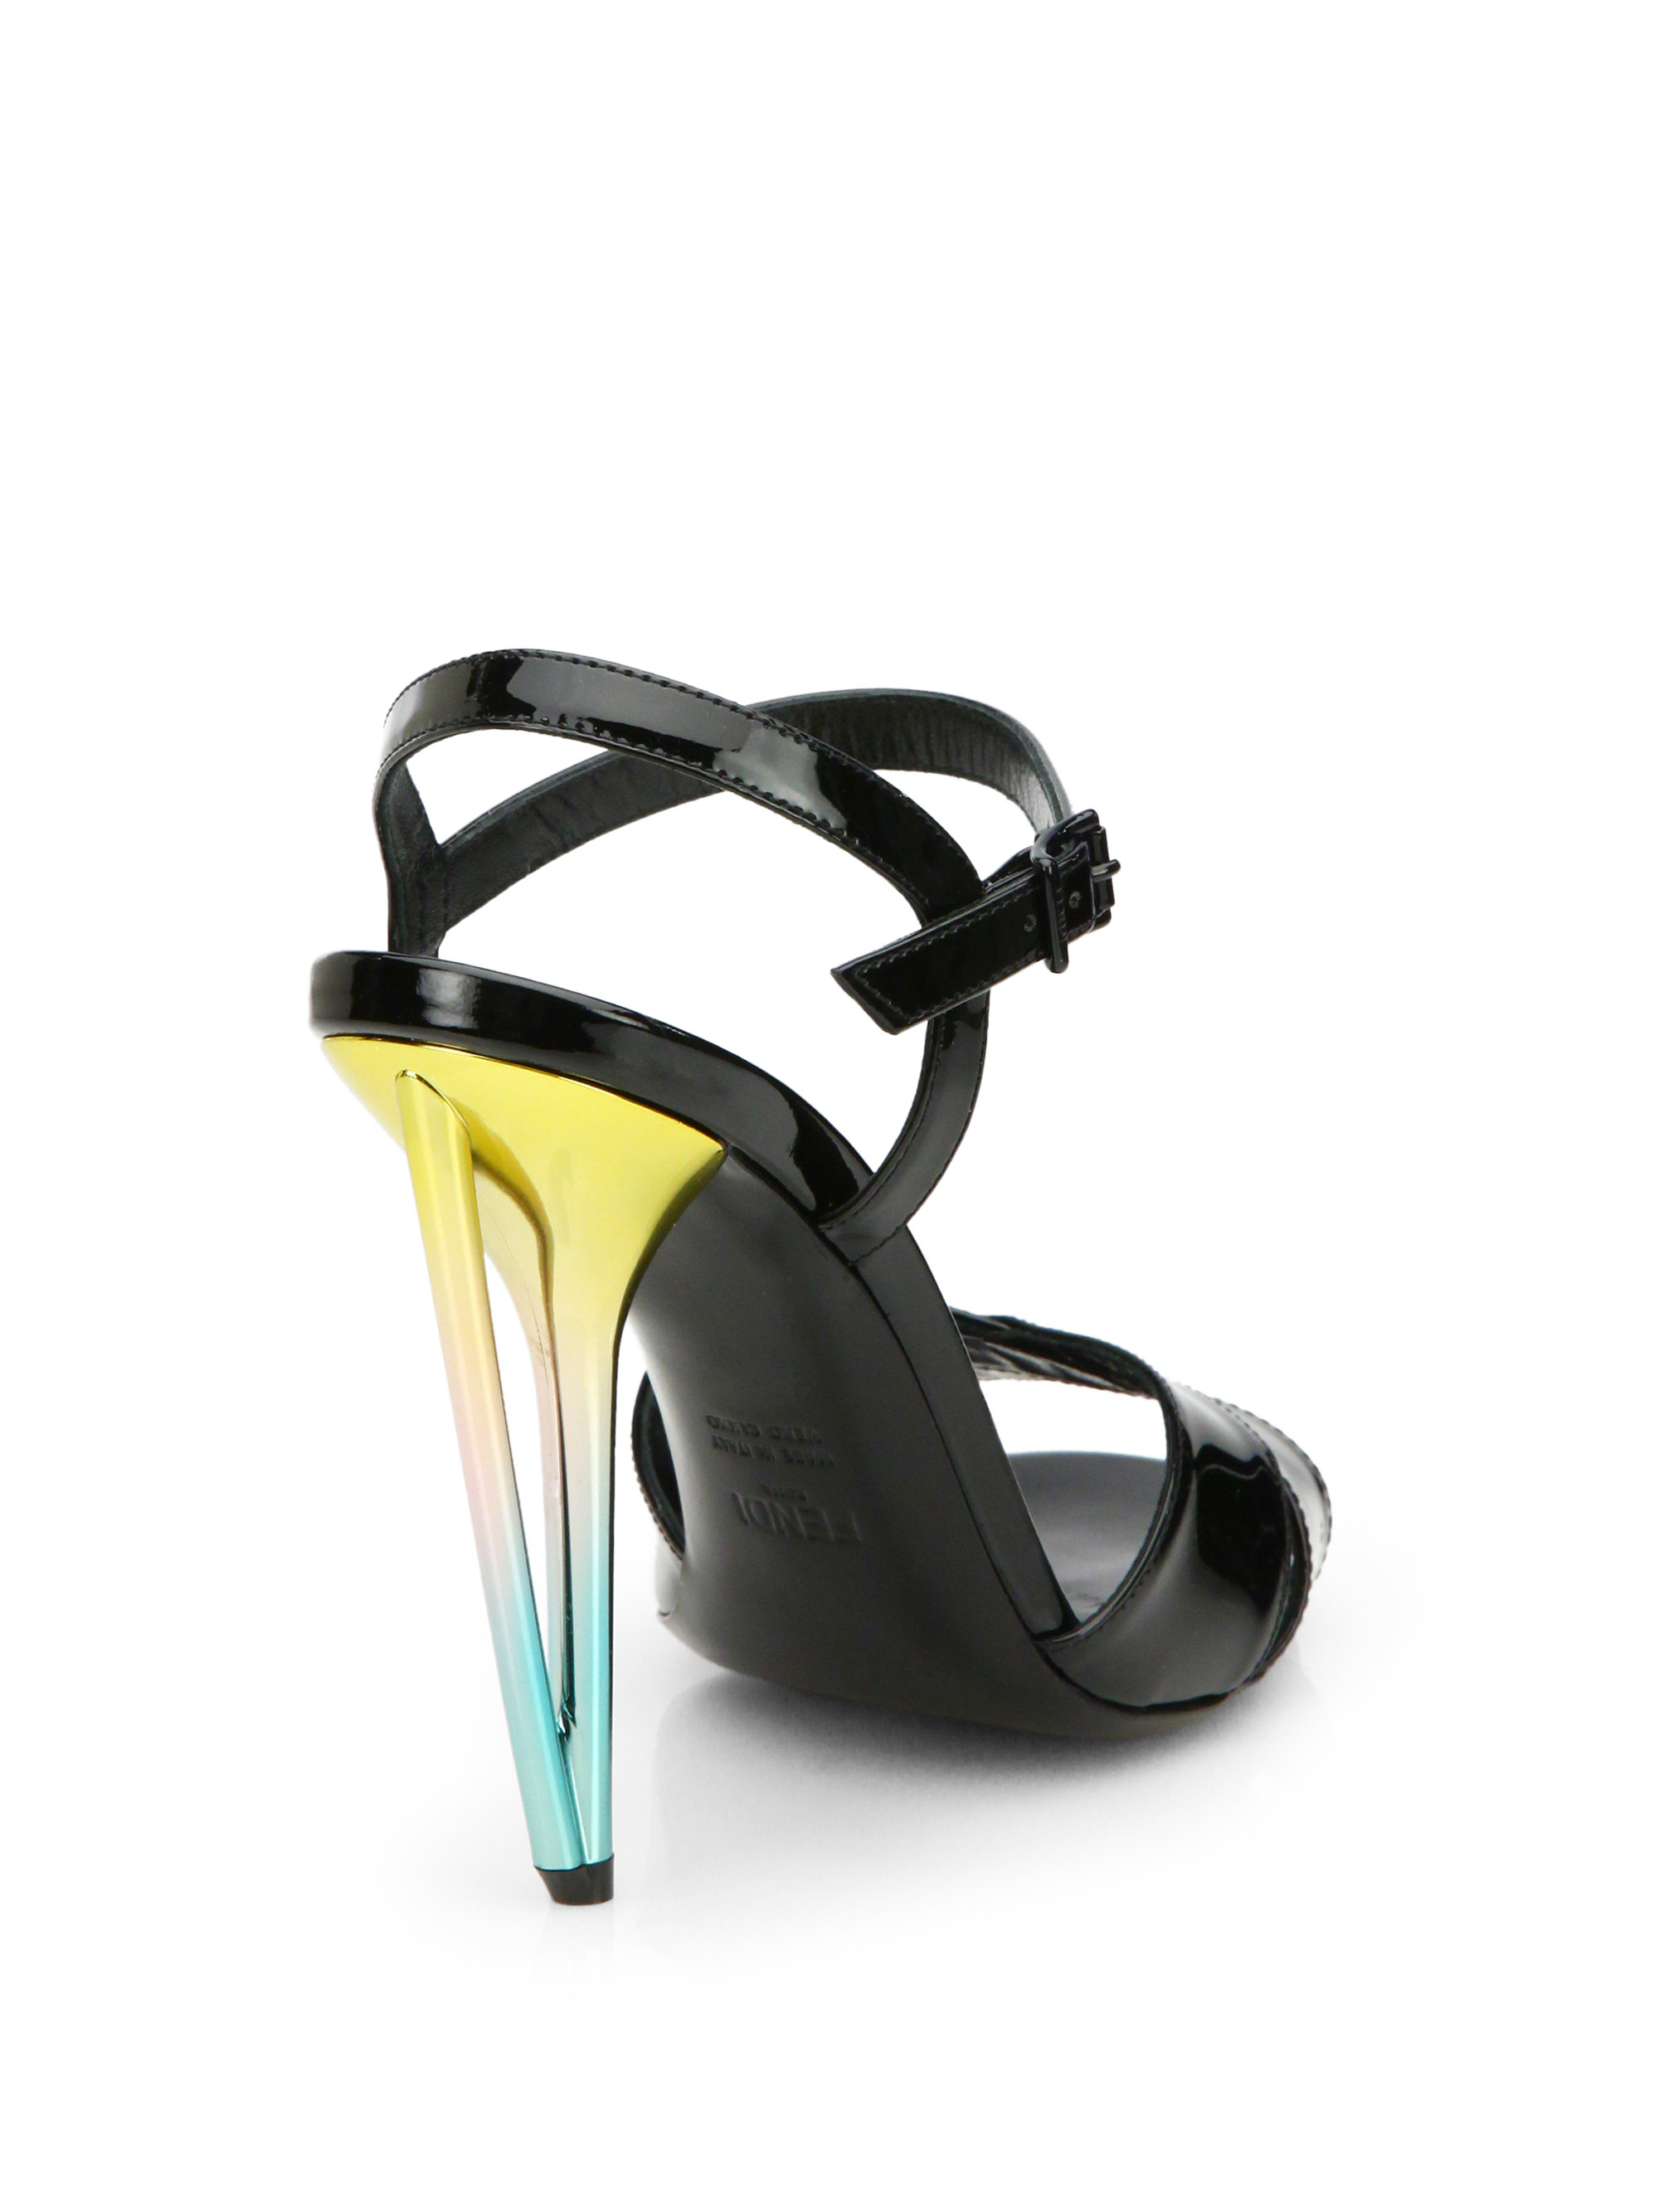 fendi patent leather metallic heel sandals in black lyst. Black Bedroom Furniture Sets. Home Design Ideas